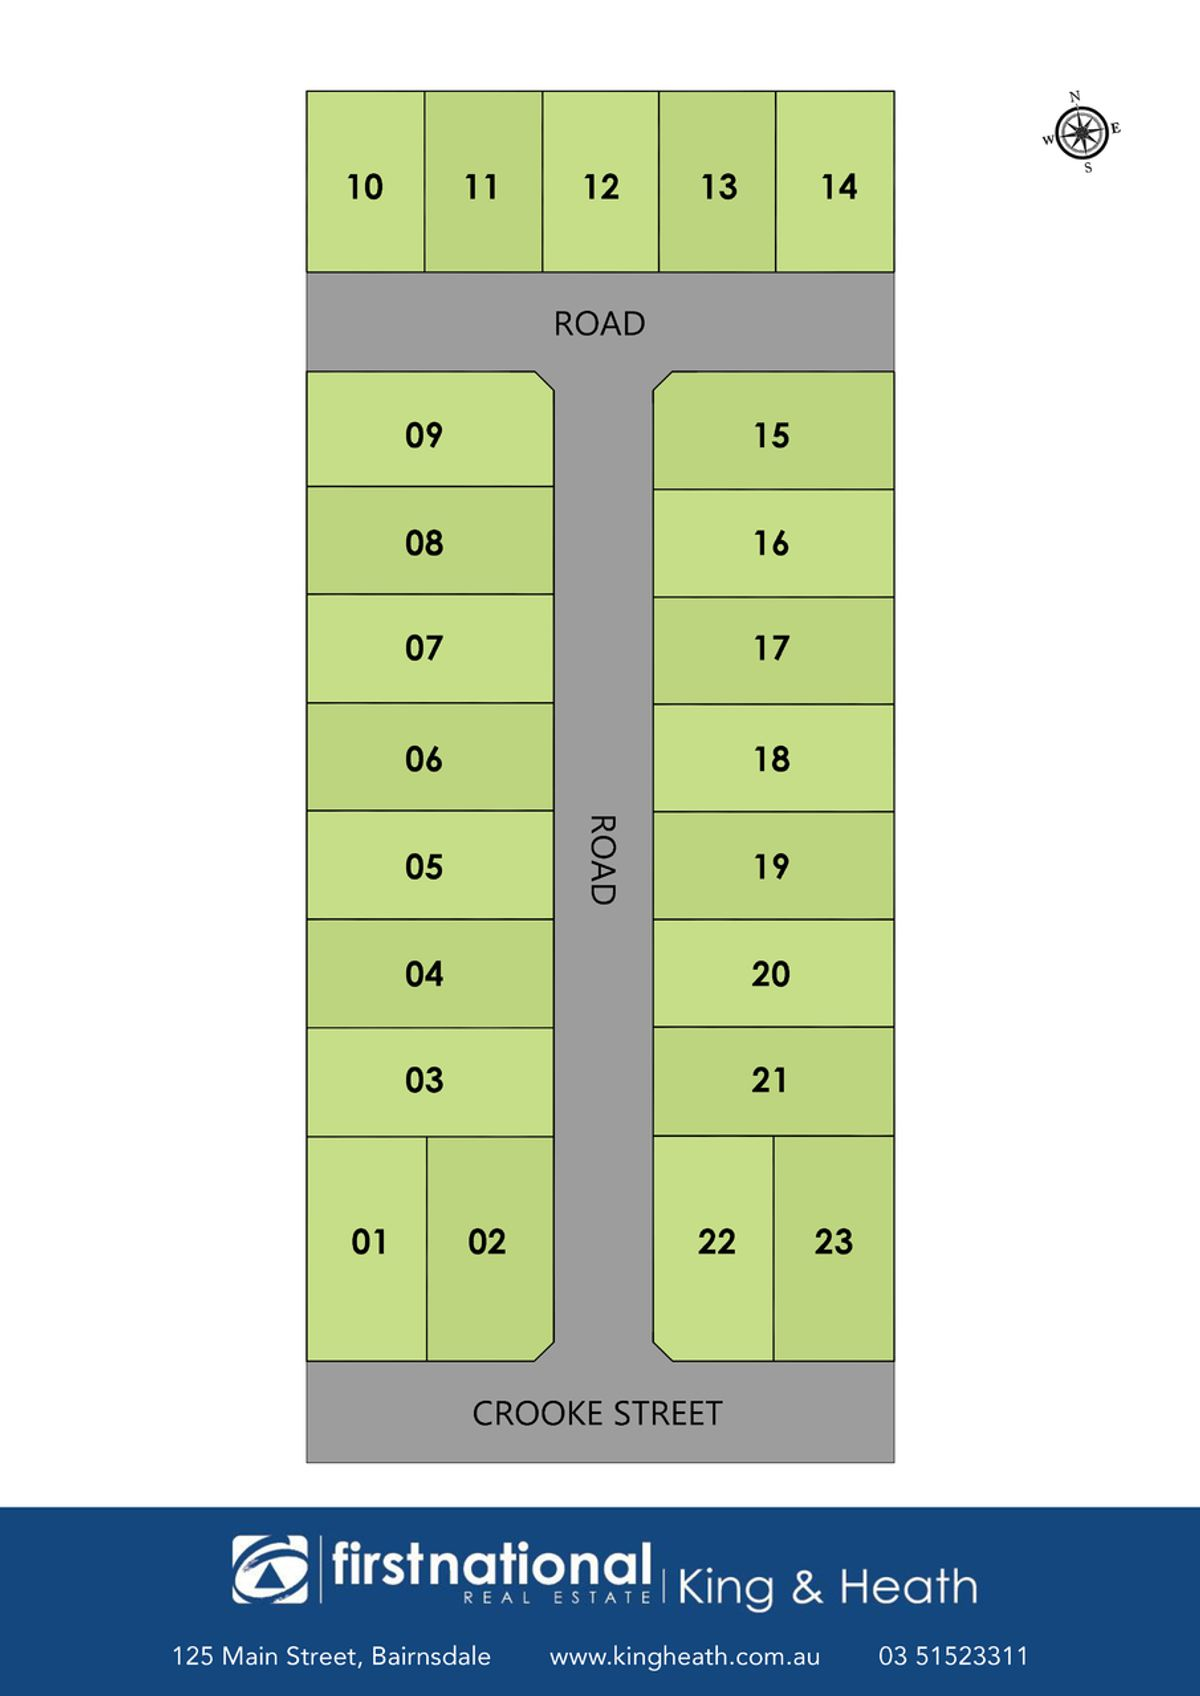 Lt 12, 103 Crooke Street, East Bairnsdale, VIC 3875